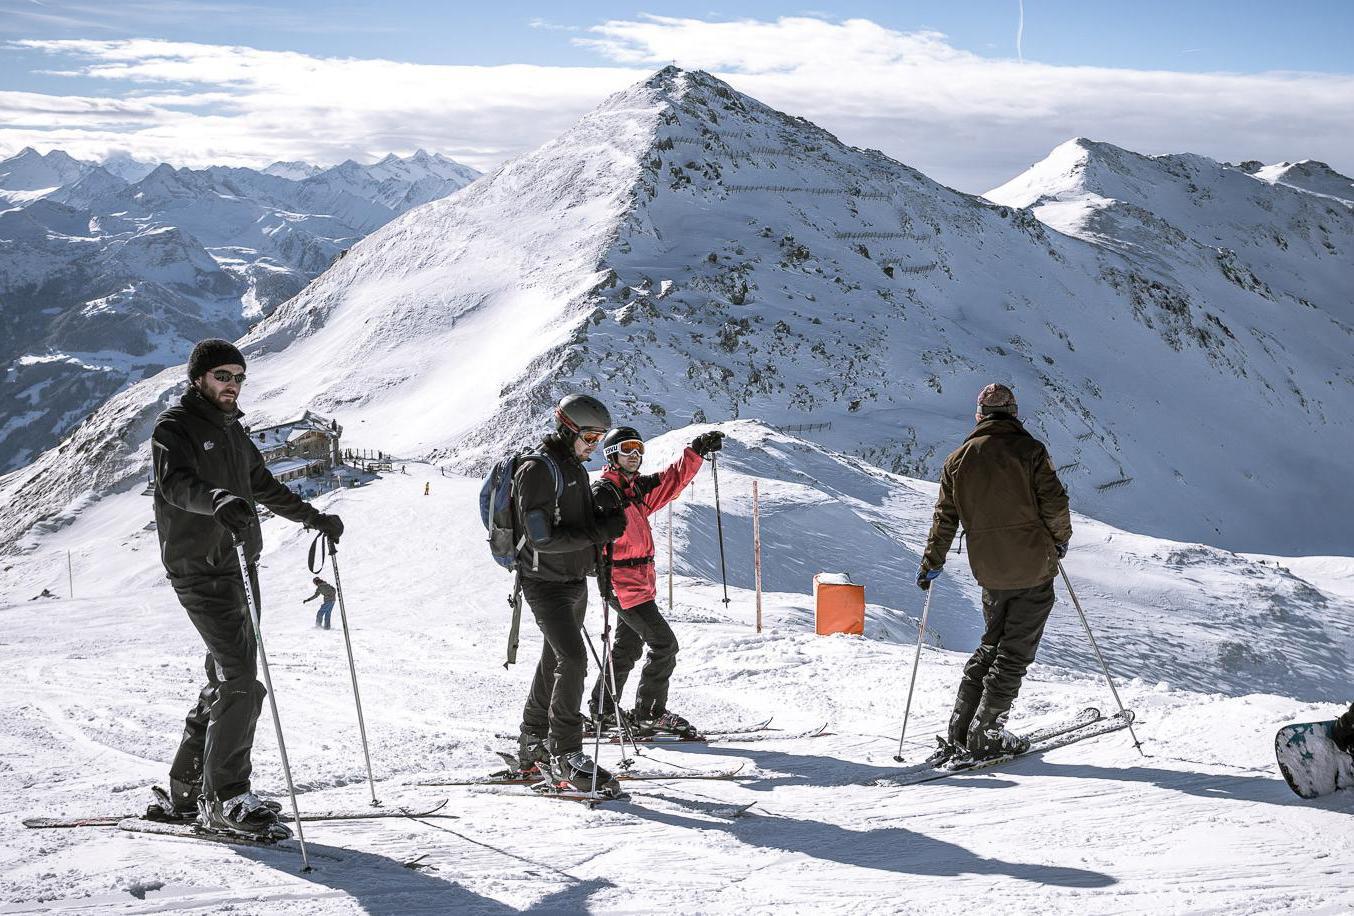 Ski Lessons for Adults - Intermediate